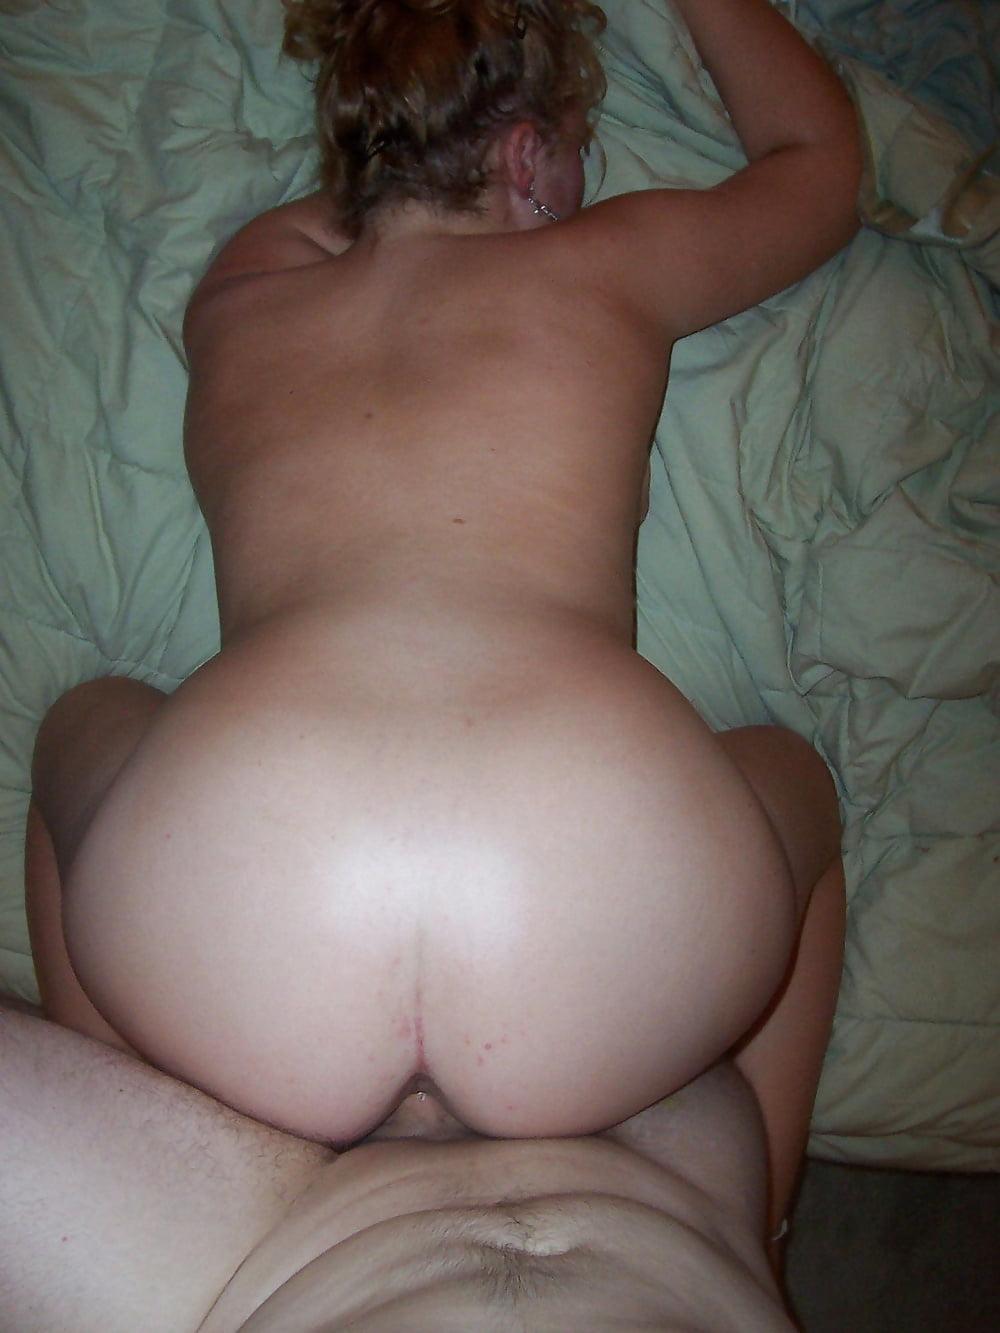 russkoe-chastnoe-porno-v-tele